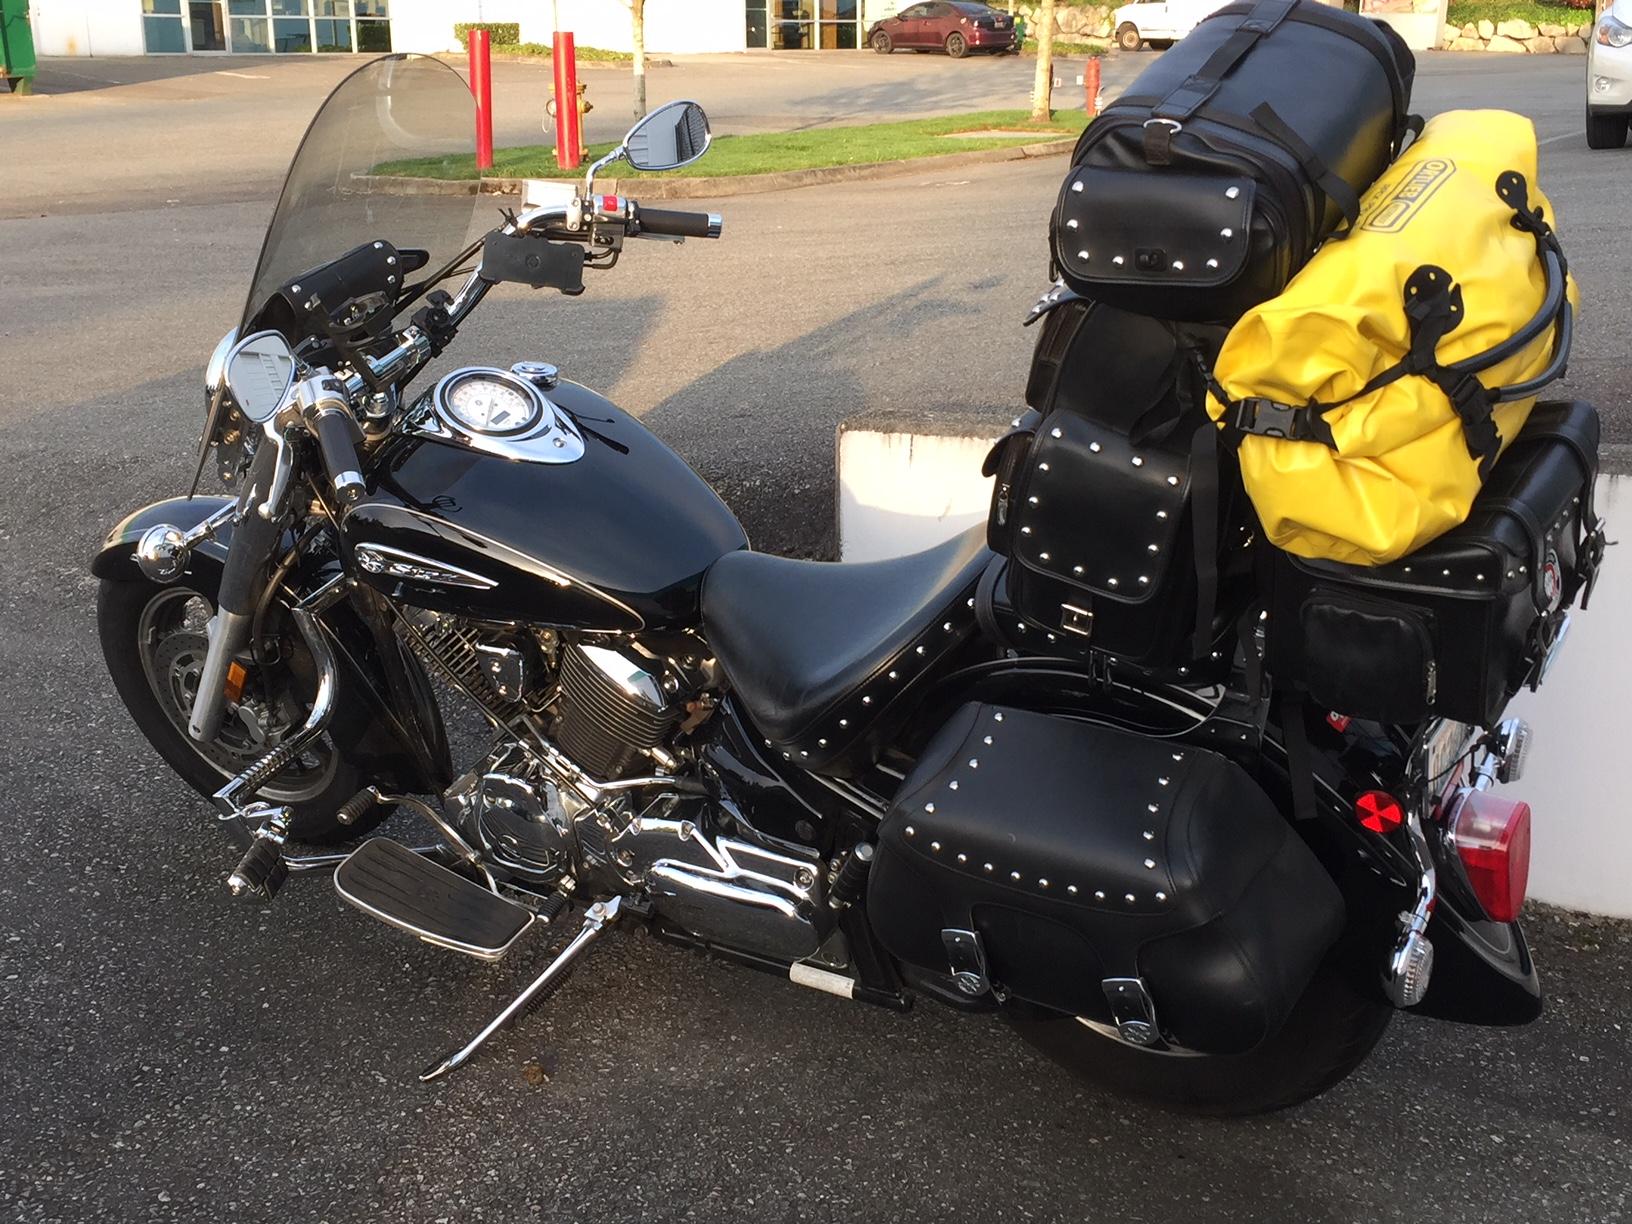 Ruth-Belcher-Global-Moto-Adventures-Motorcycle-Podcast-Adventure-Rider-Radio-3.jpeg